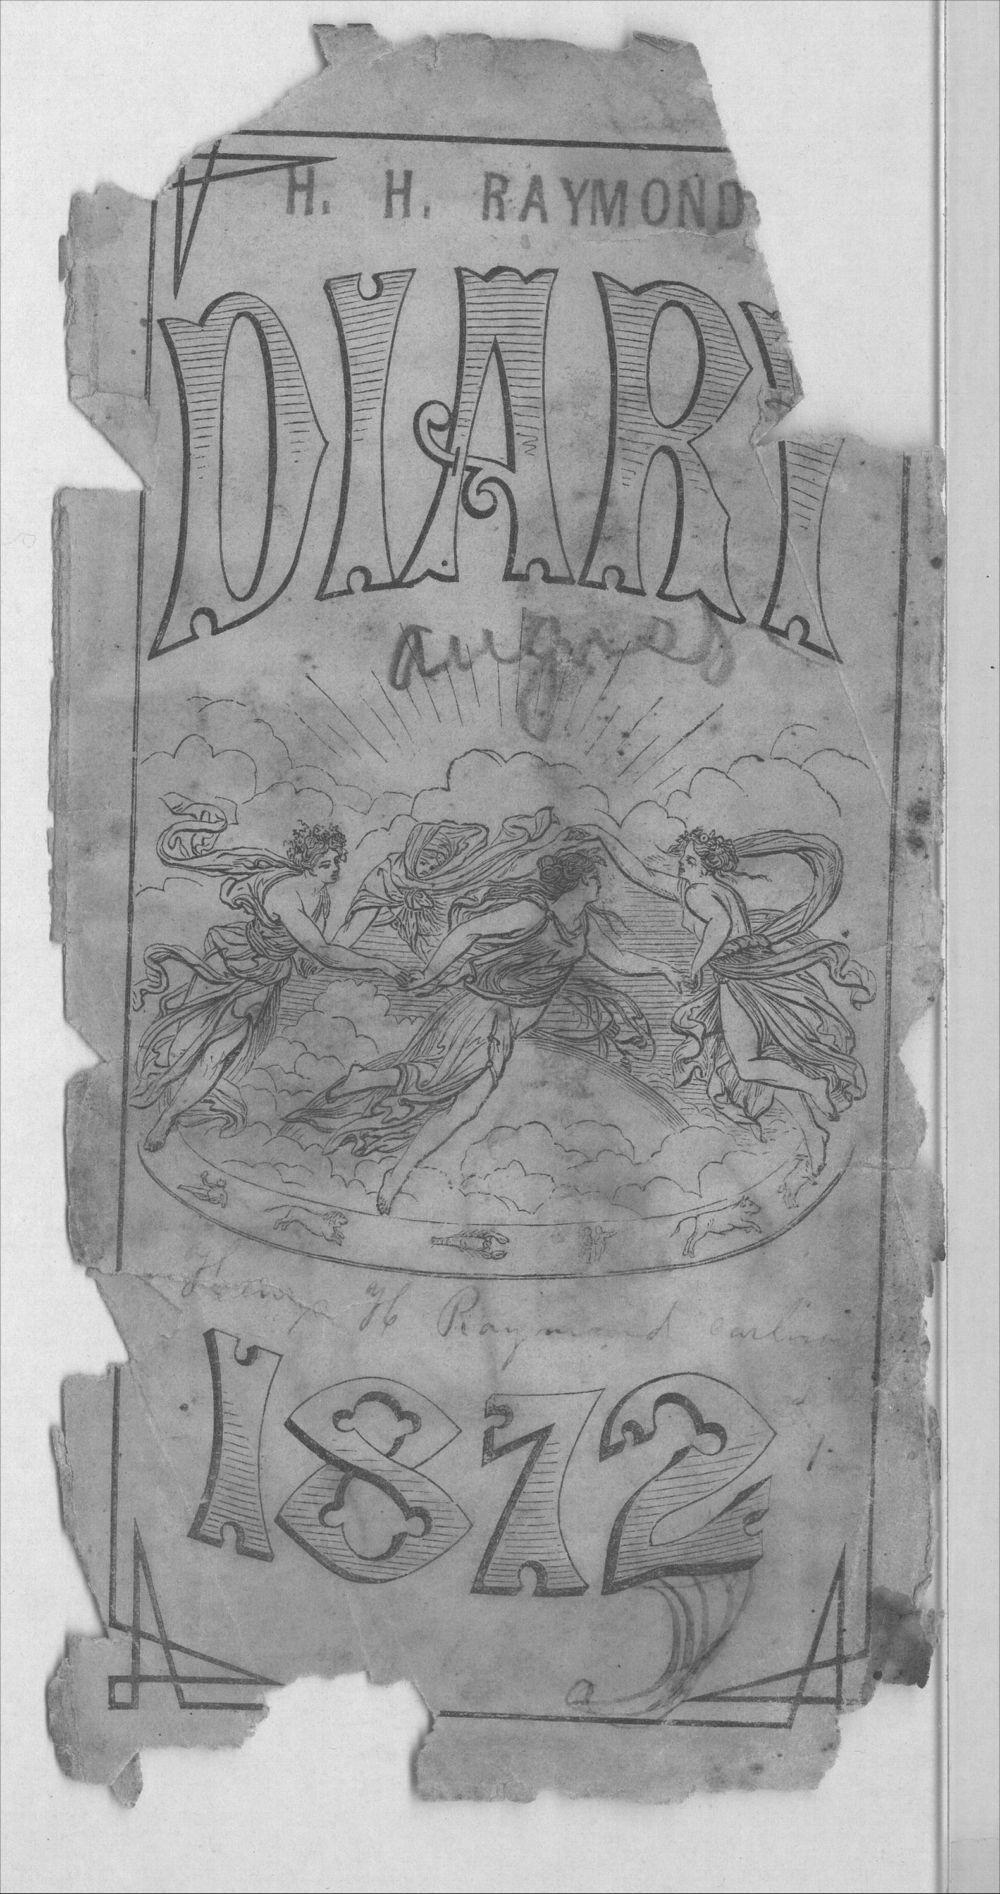 Henry Raymond diary - Title